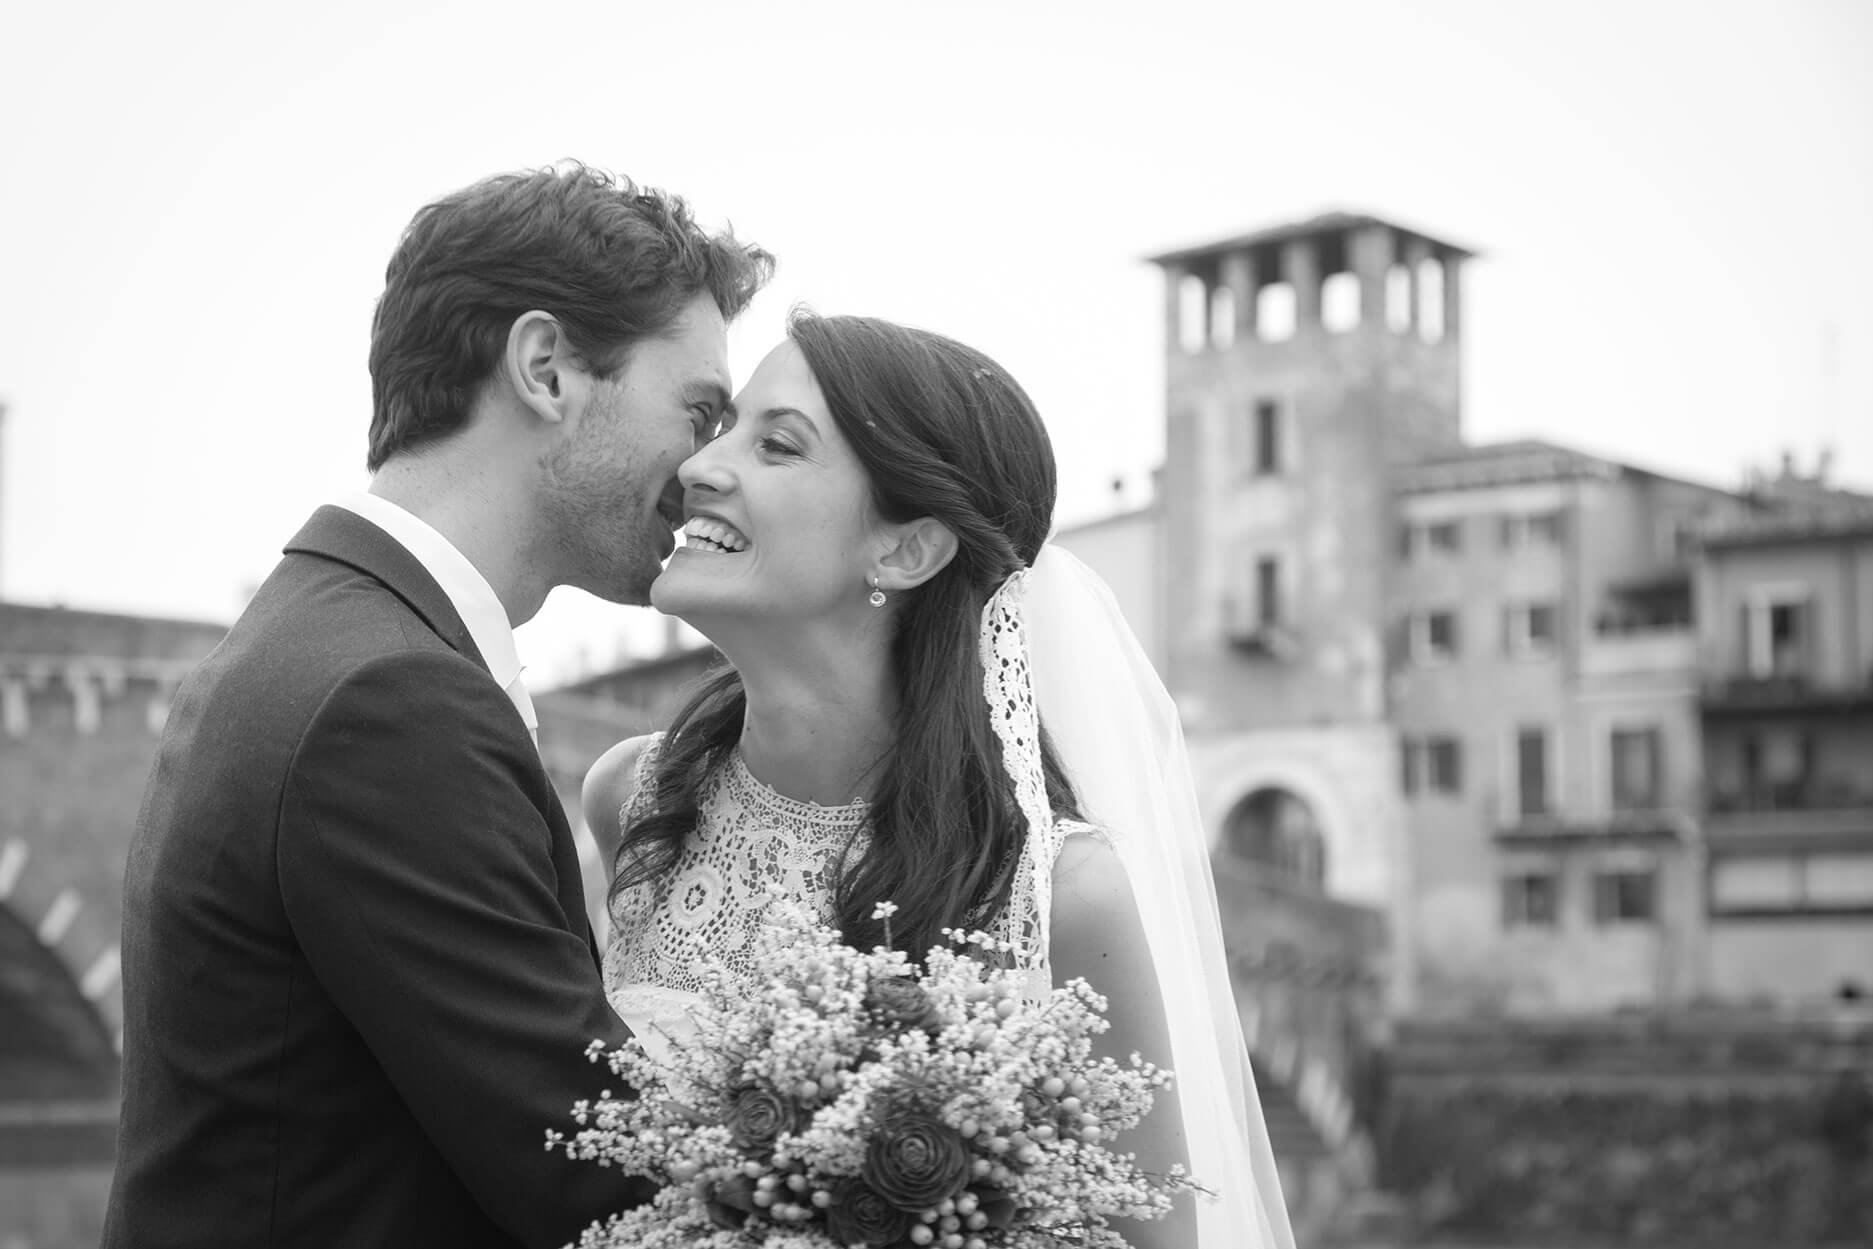 Francesca-Ferrati-WeddingIMG_0940